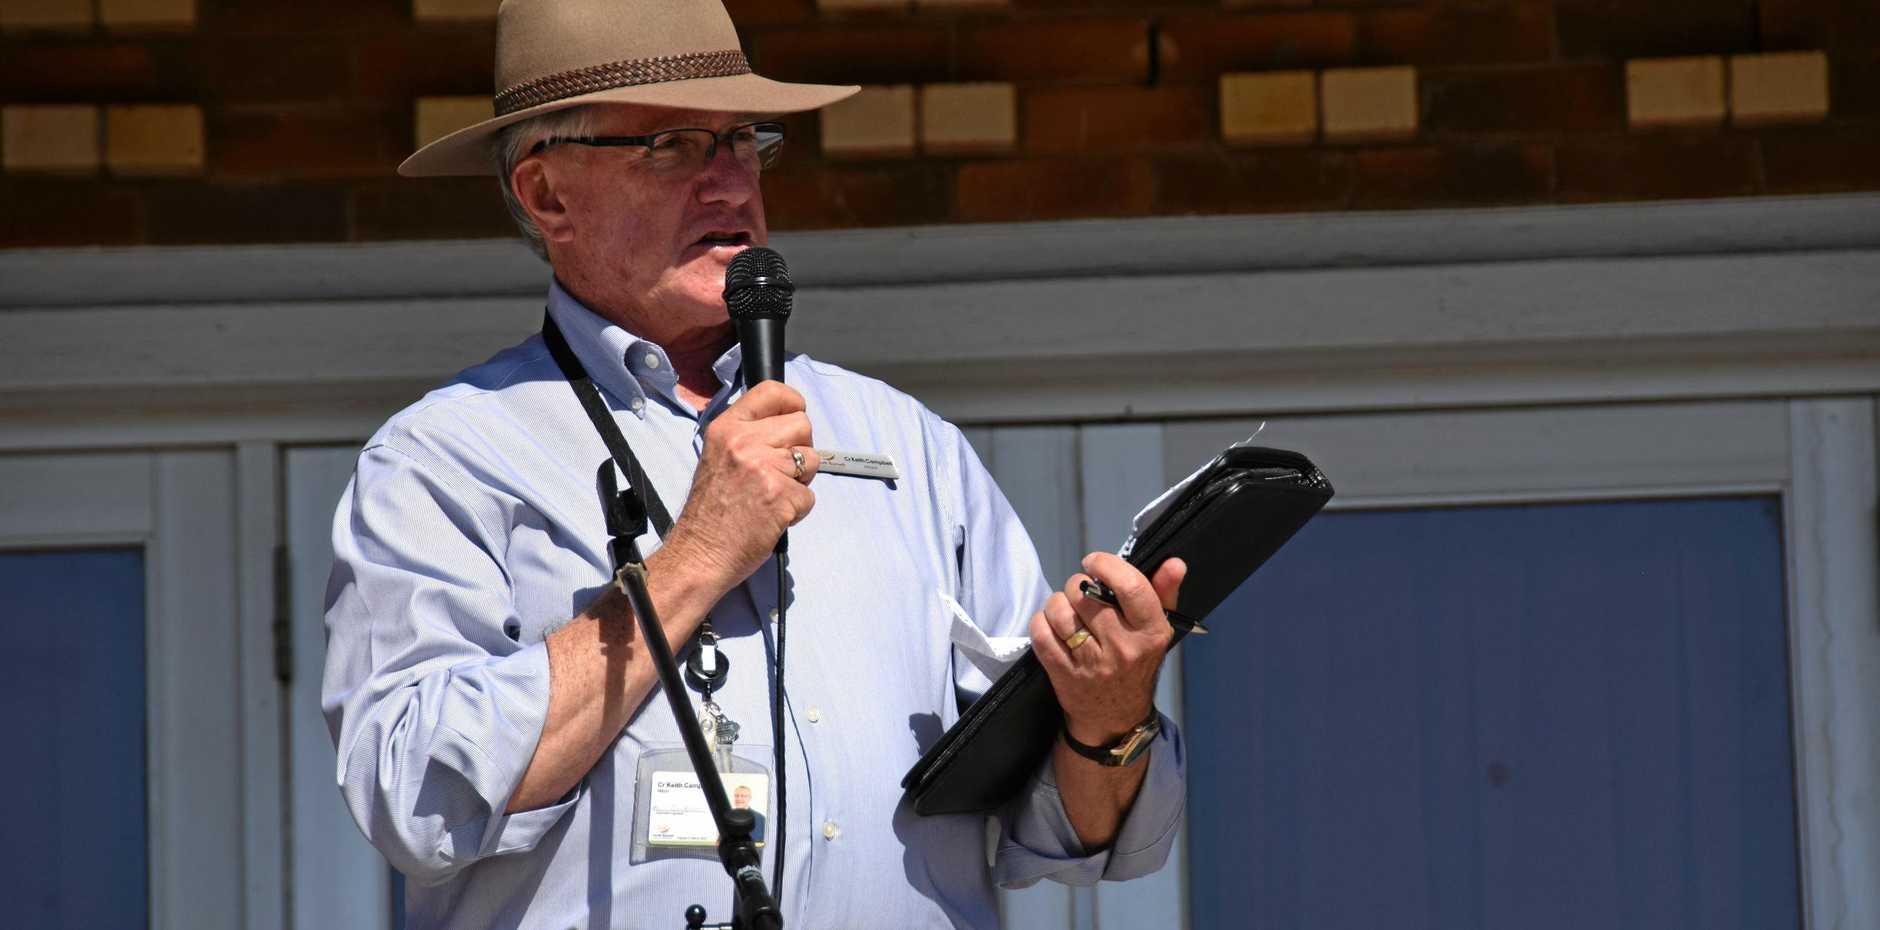 Mayor Keith Campbell